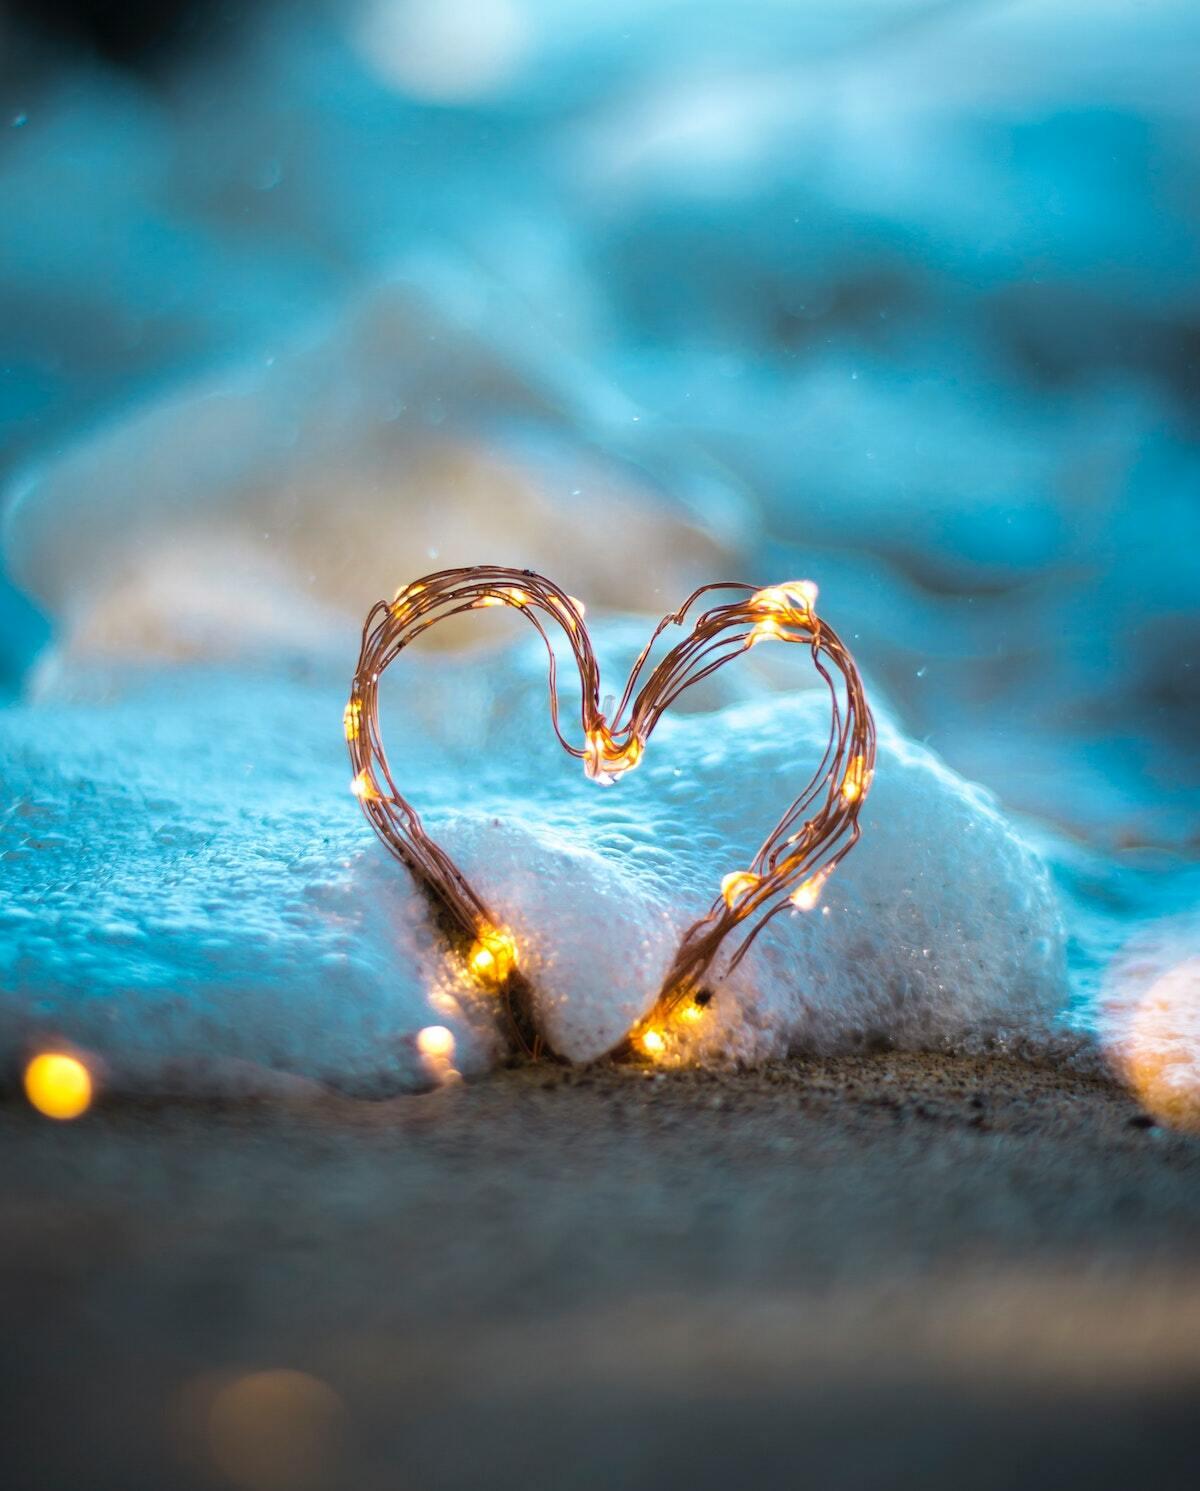 Saint Valentin ©Steve-halama-unsplash